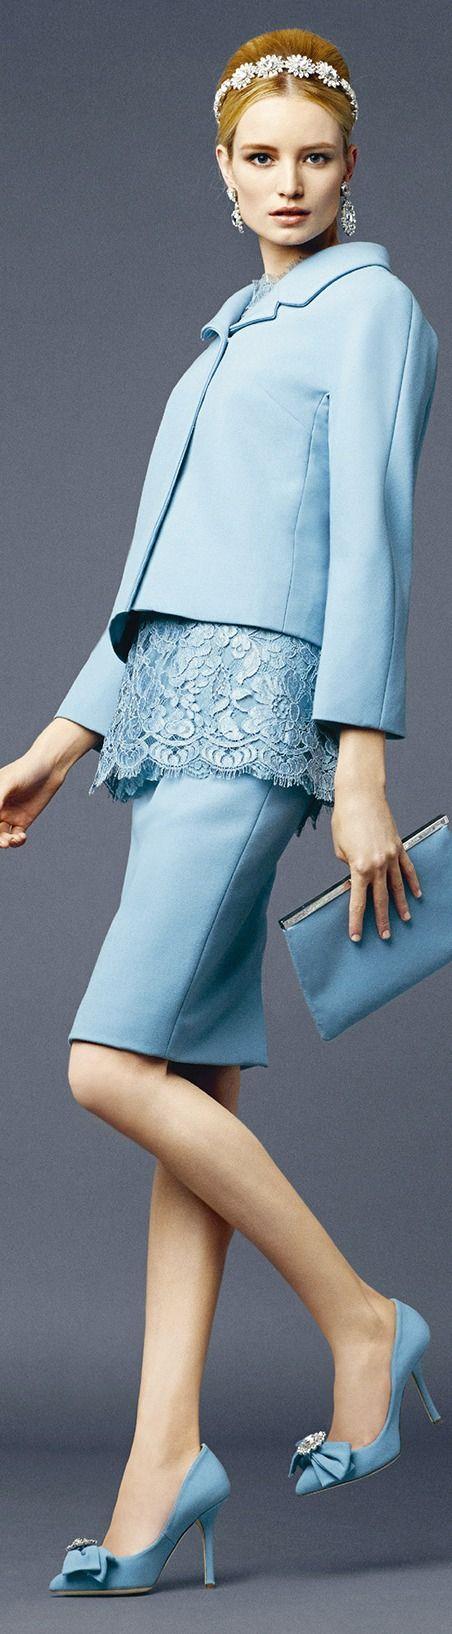 Dolce & Gabbana, Spring/Summer 2014, Blue♔PM